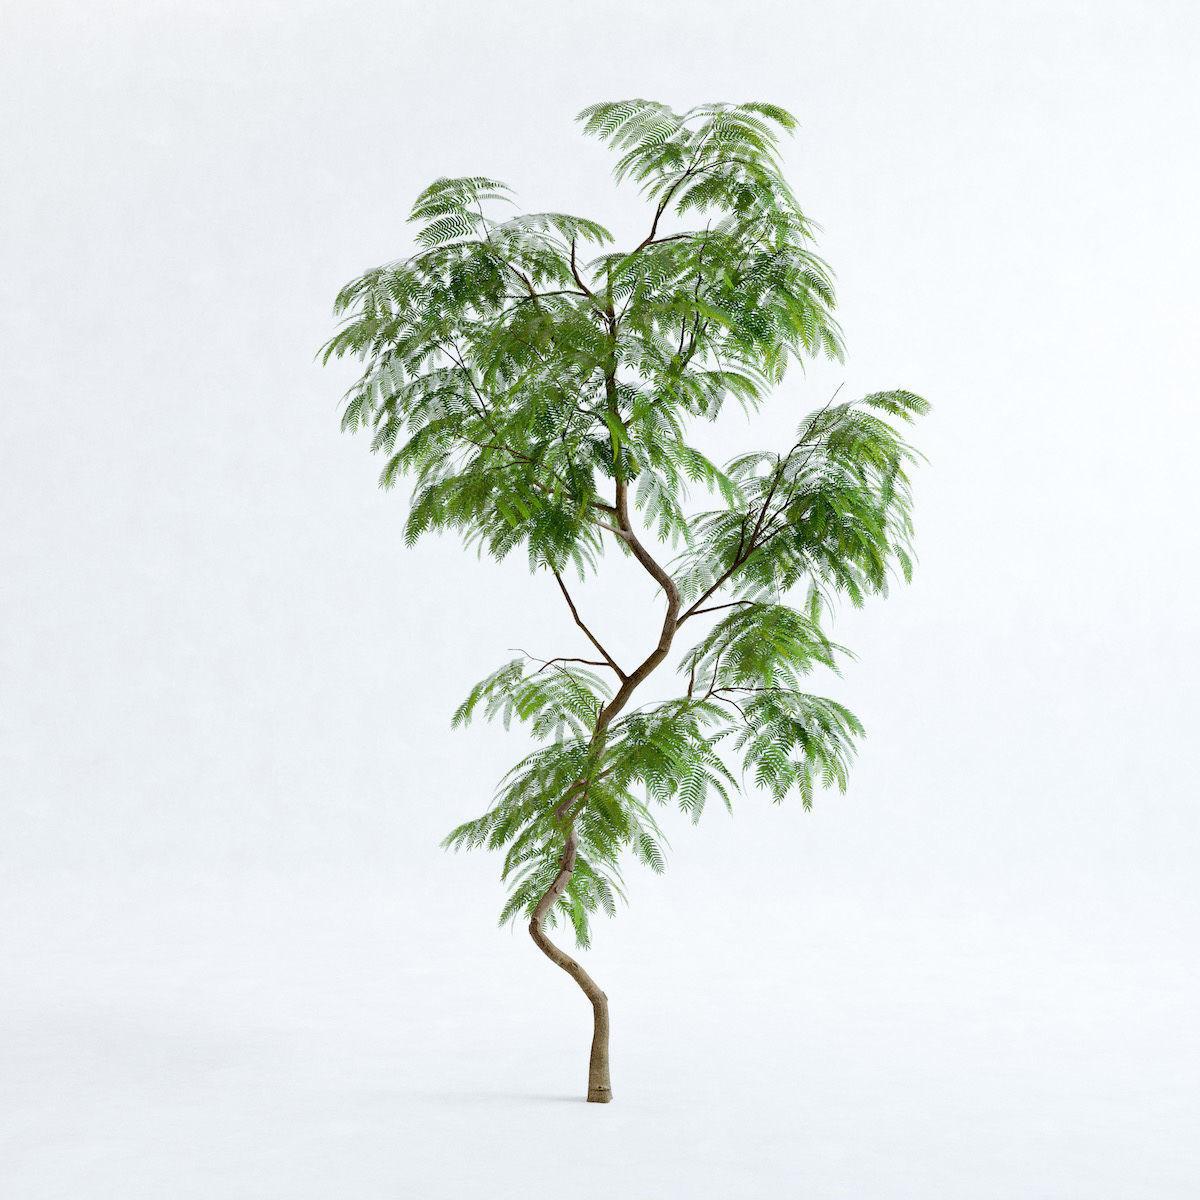 Everfresh Tree 2M - Cojoba arborea var angustifolia